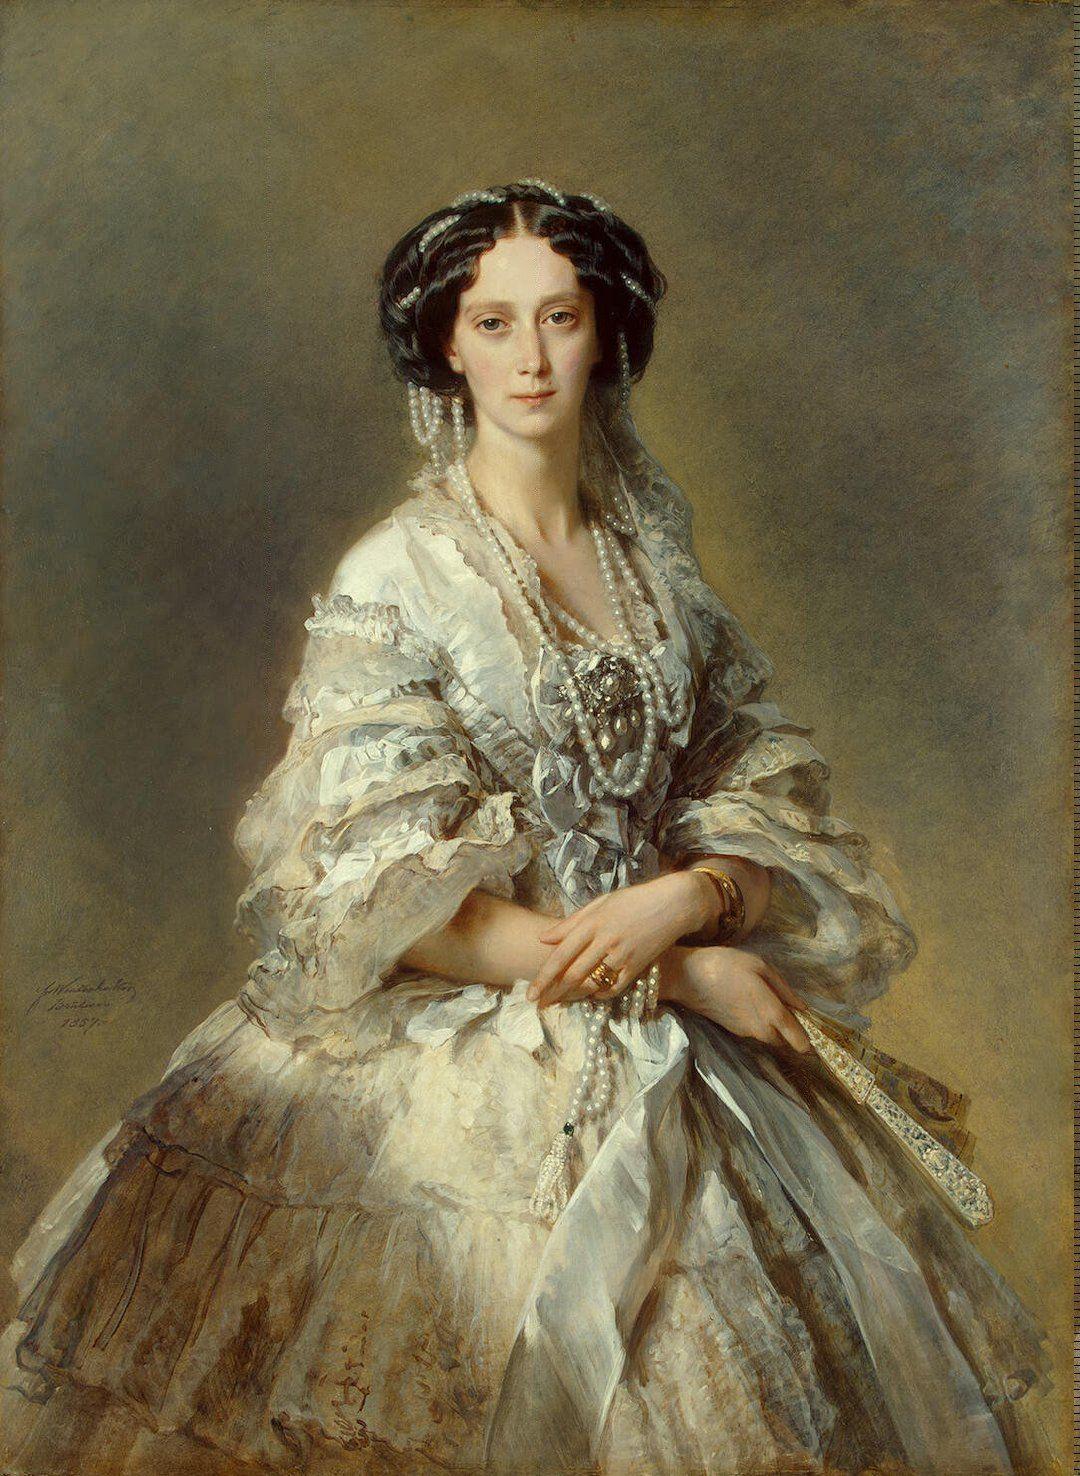 Portrait of Empress Maria Alexandrovna - Winterhalter Francois Xavier